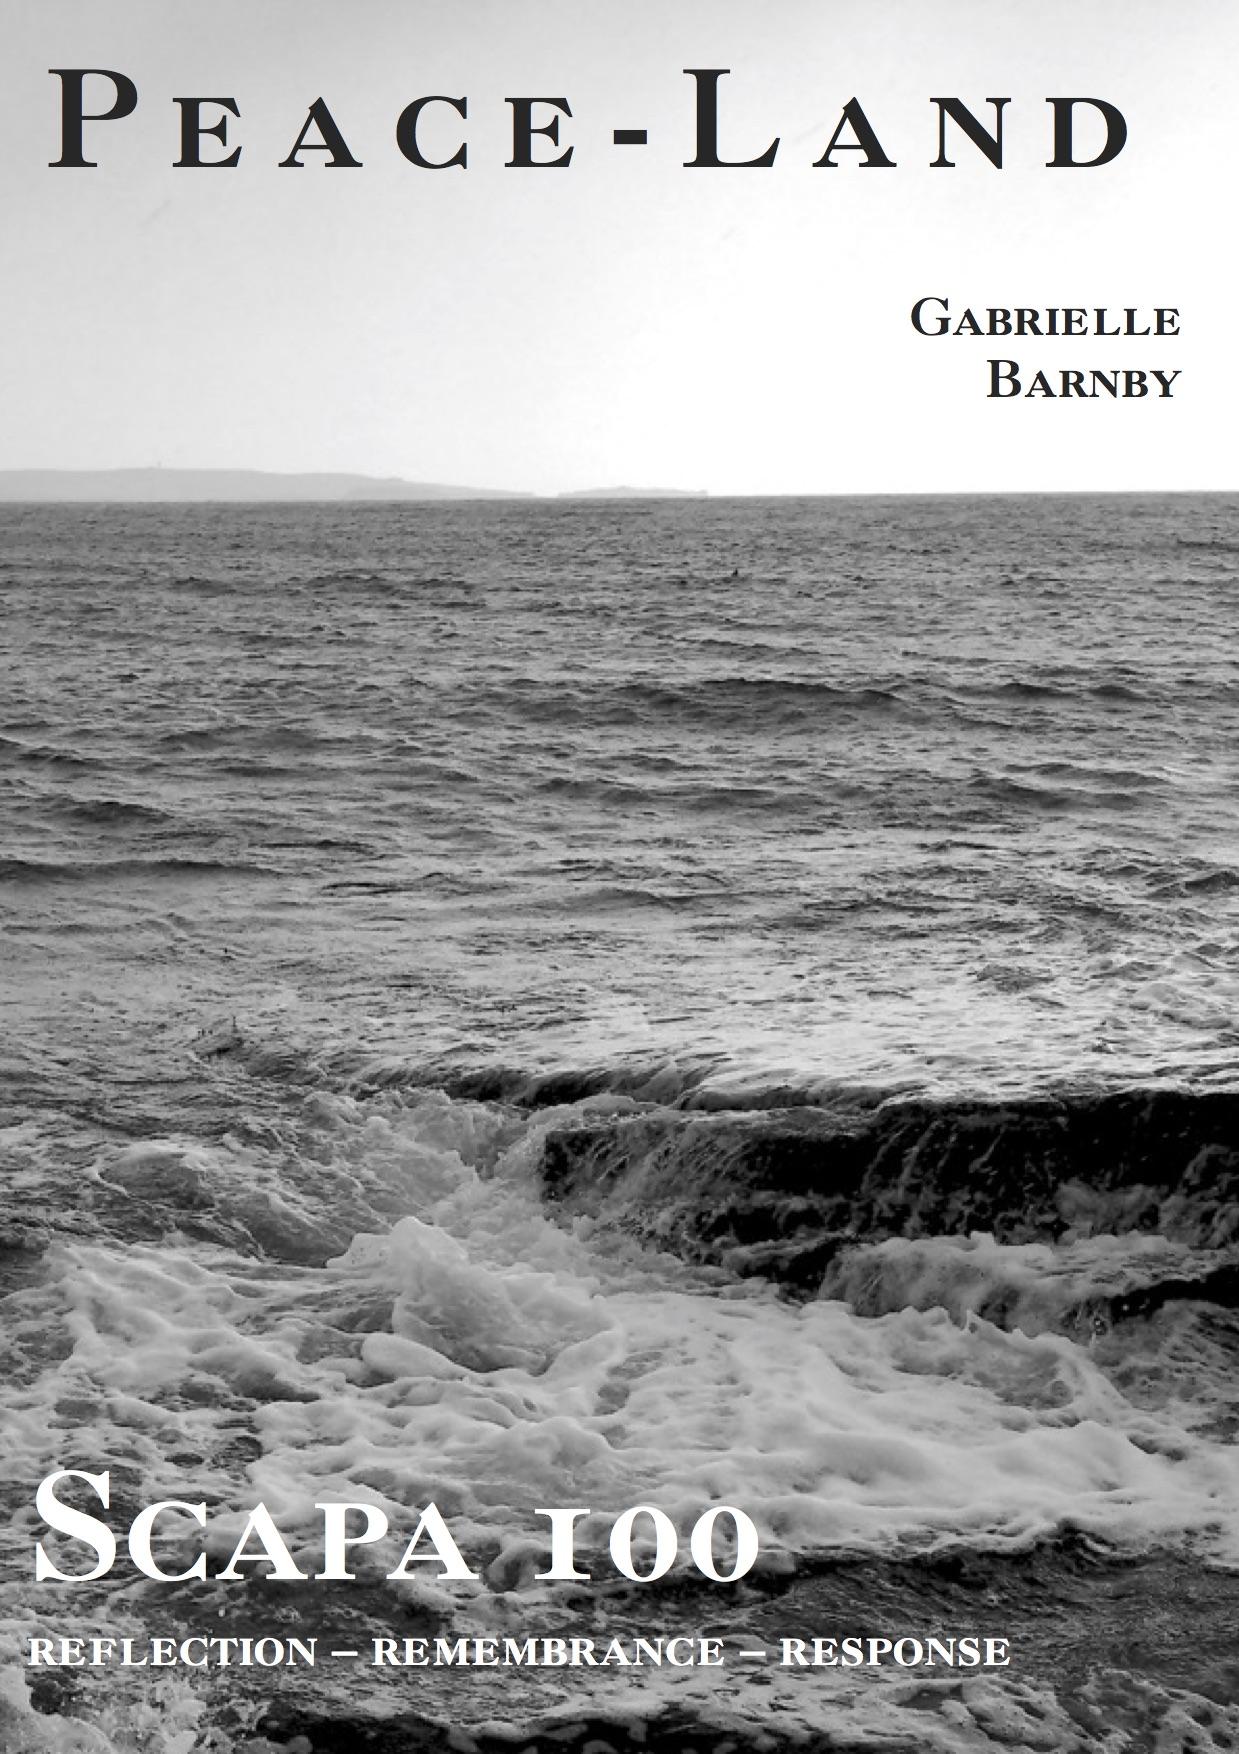 Scapa100, Peace - Land, poem, Gabrielle Barnby, Orkney, Scapa Flow, German Fleet, Anniversary, June 21st. 1919, 2019.